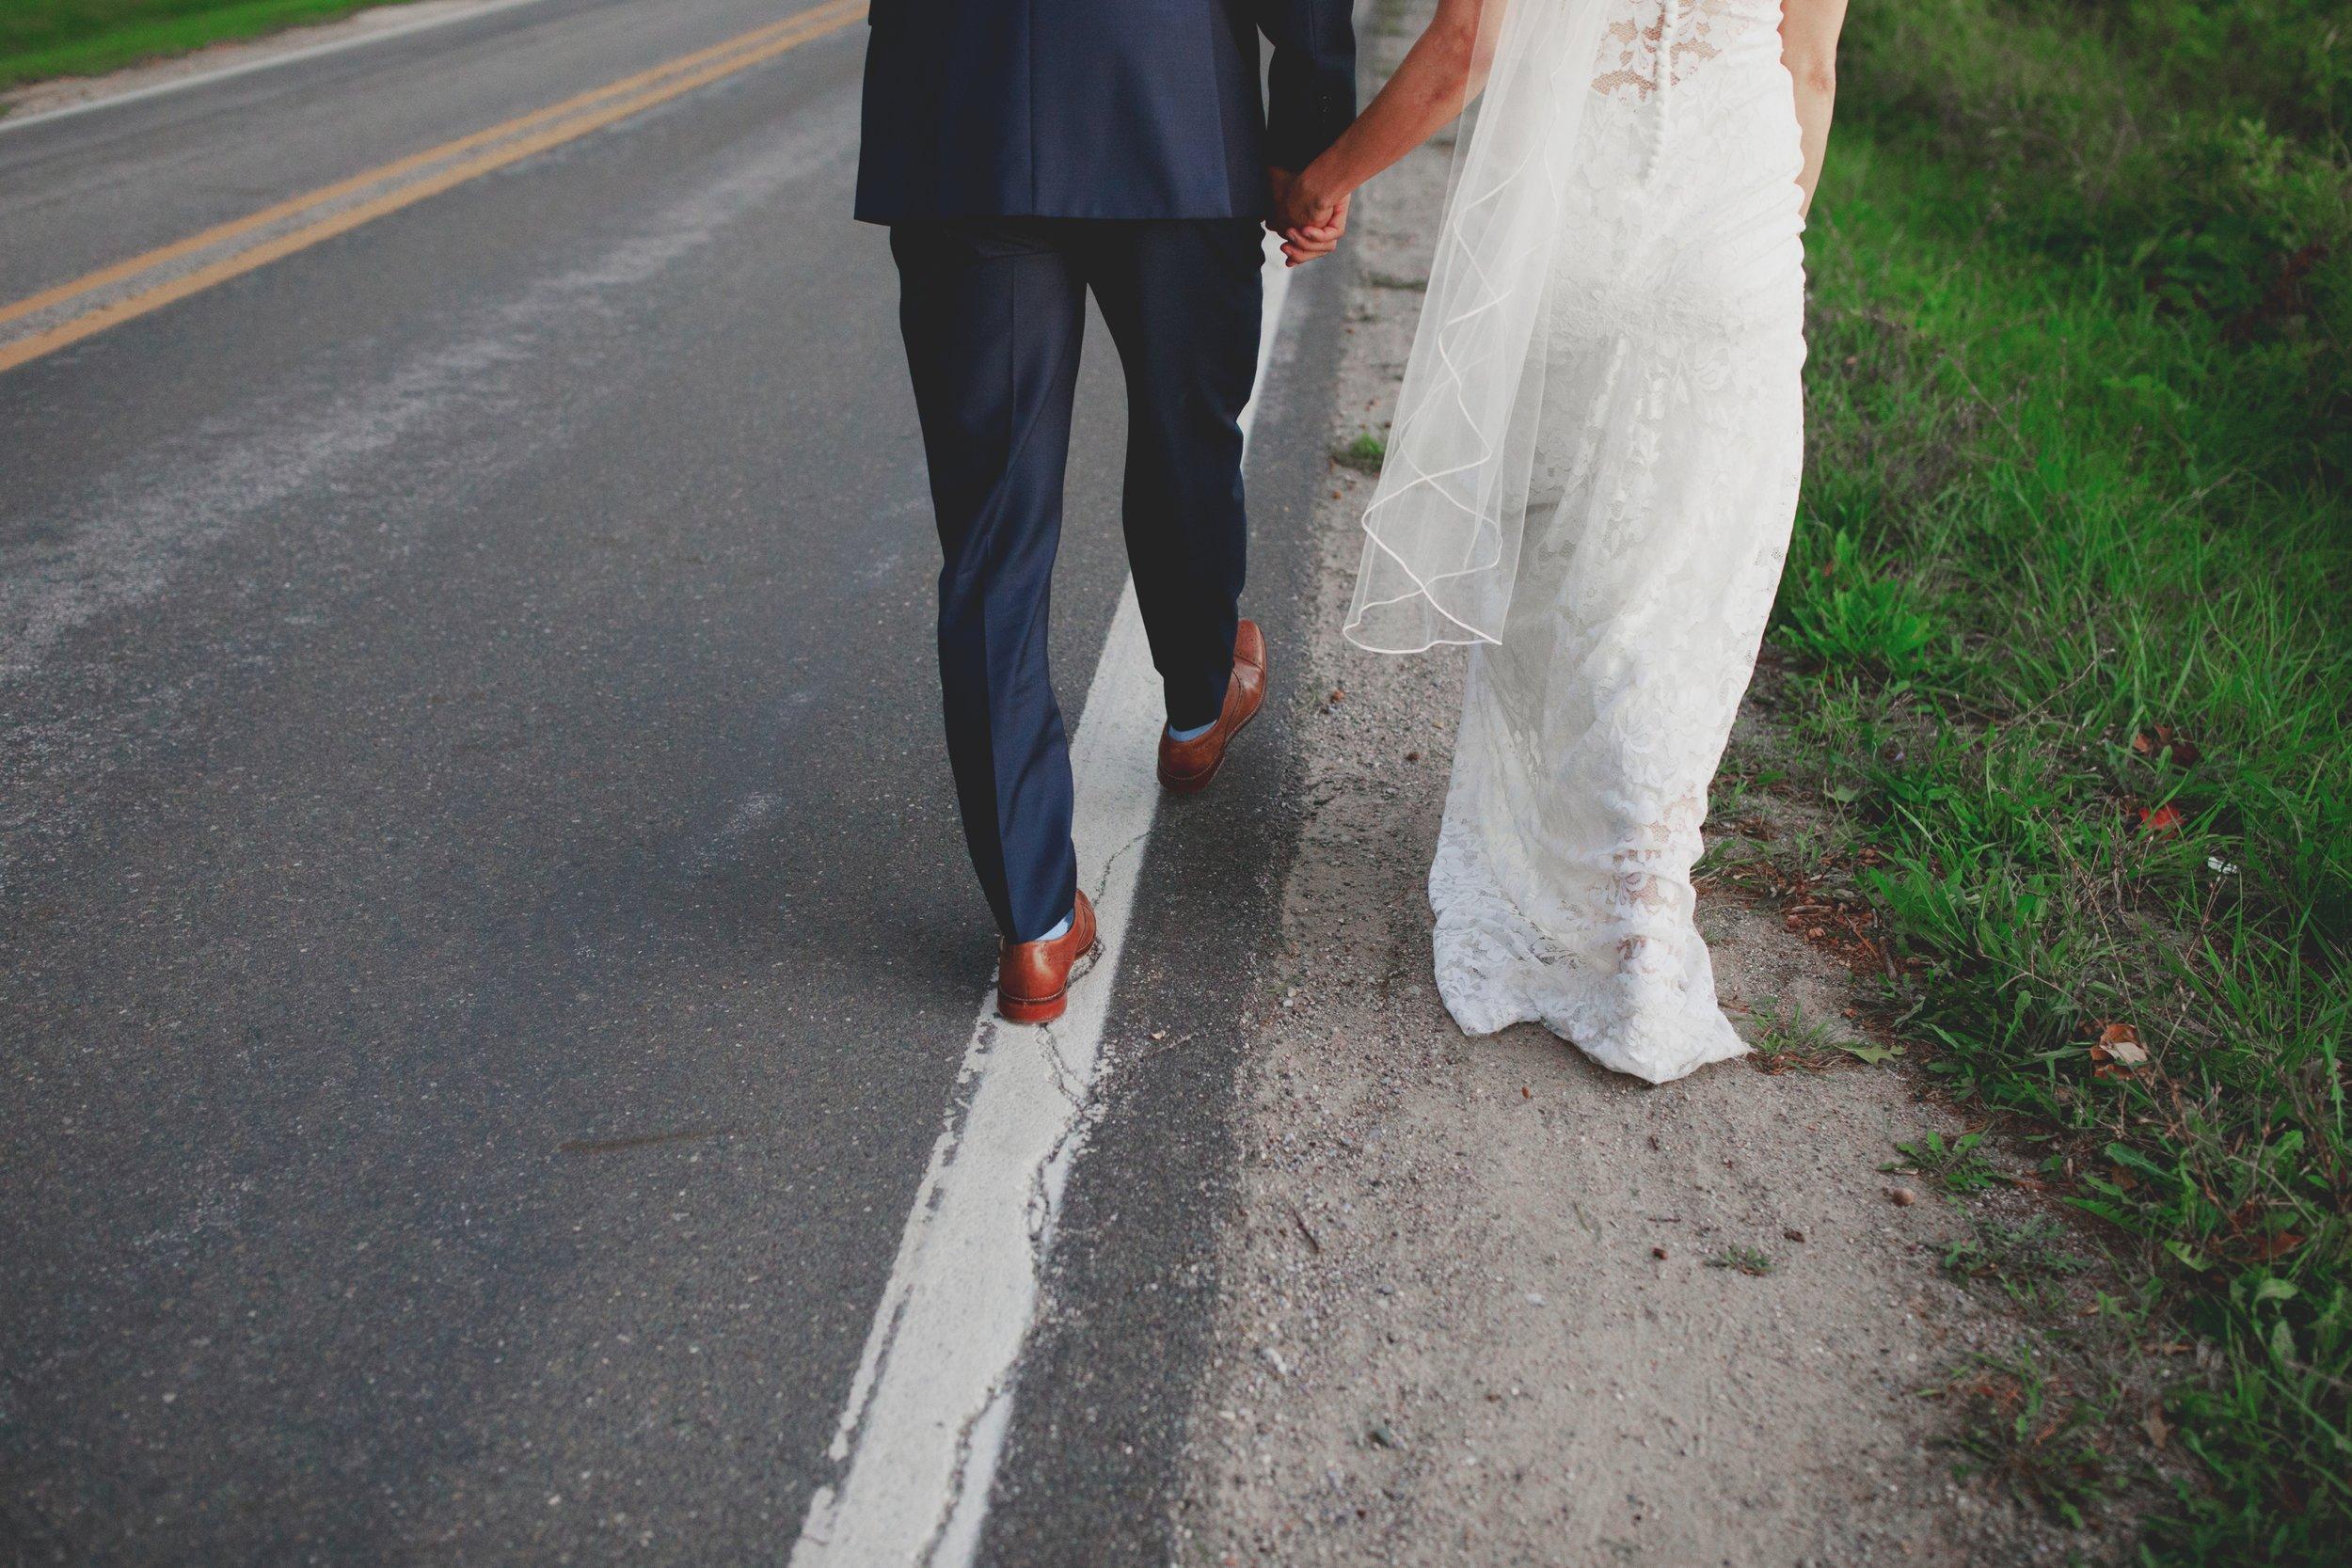 traverse_city_wedding_134.jpg